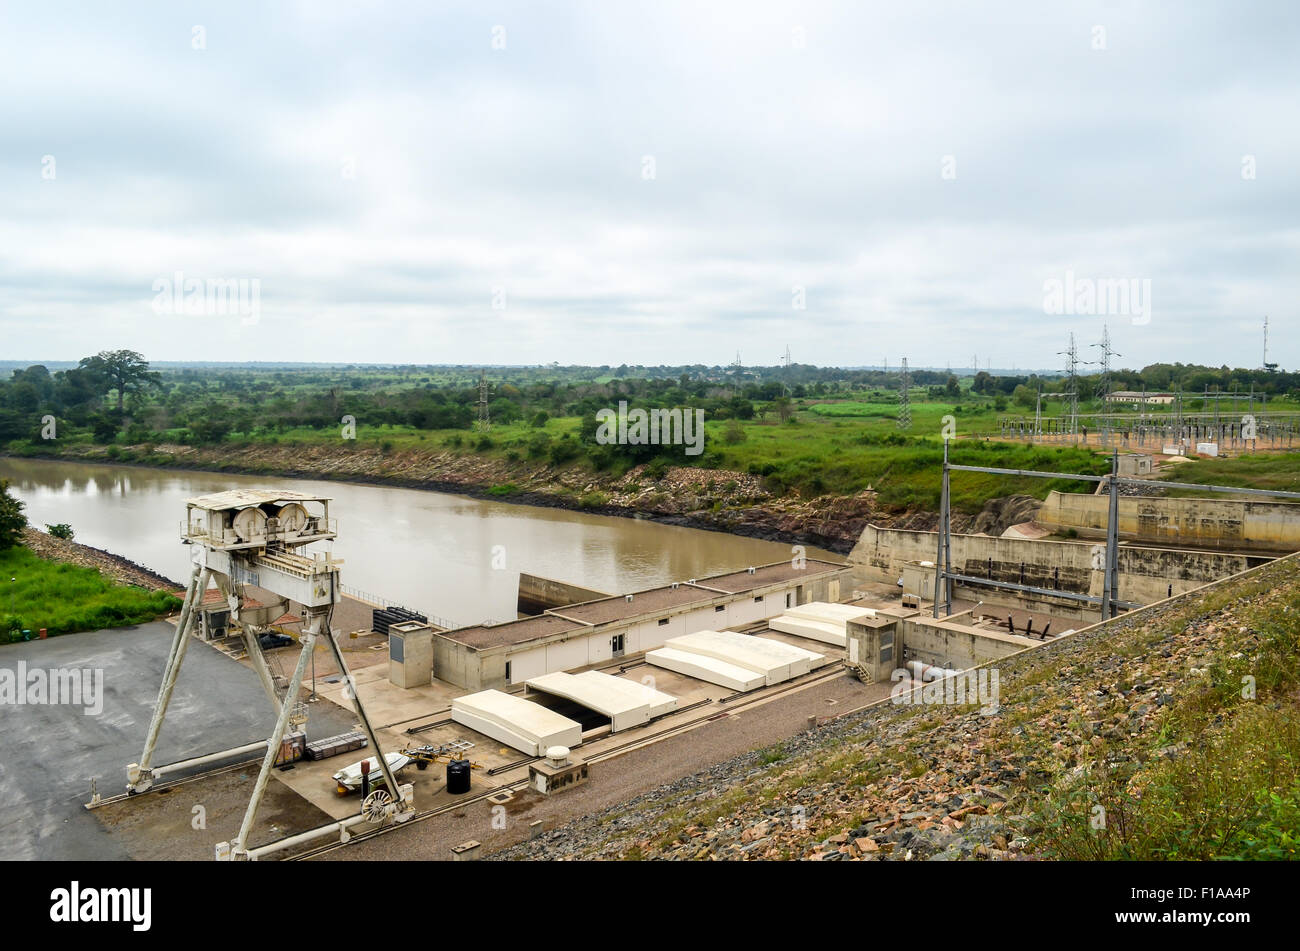 Nangbeto hydropowerplant in Togo Stock Photo